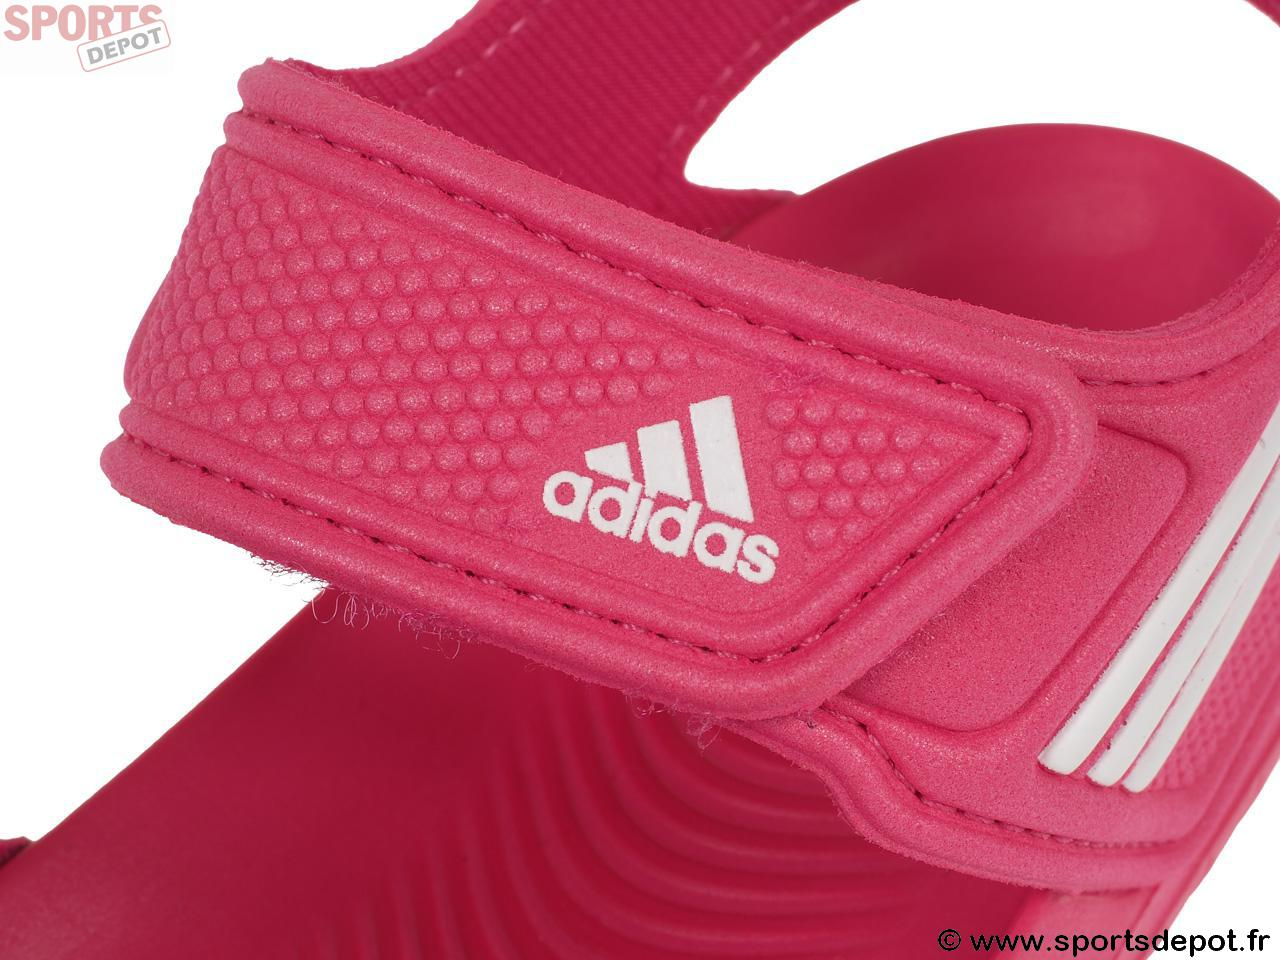 Rose Adidas Junior Acheter 9 Sandale Bab Akwah Sandales Baby q8nzw5zaXx